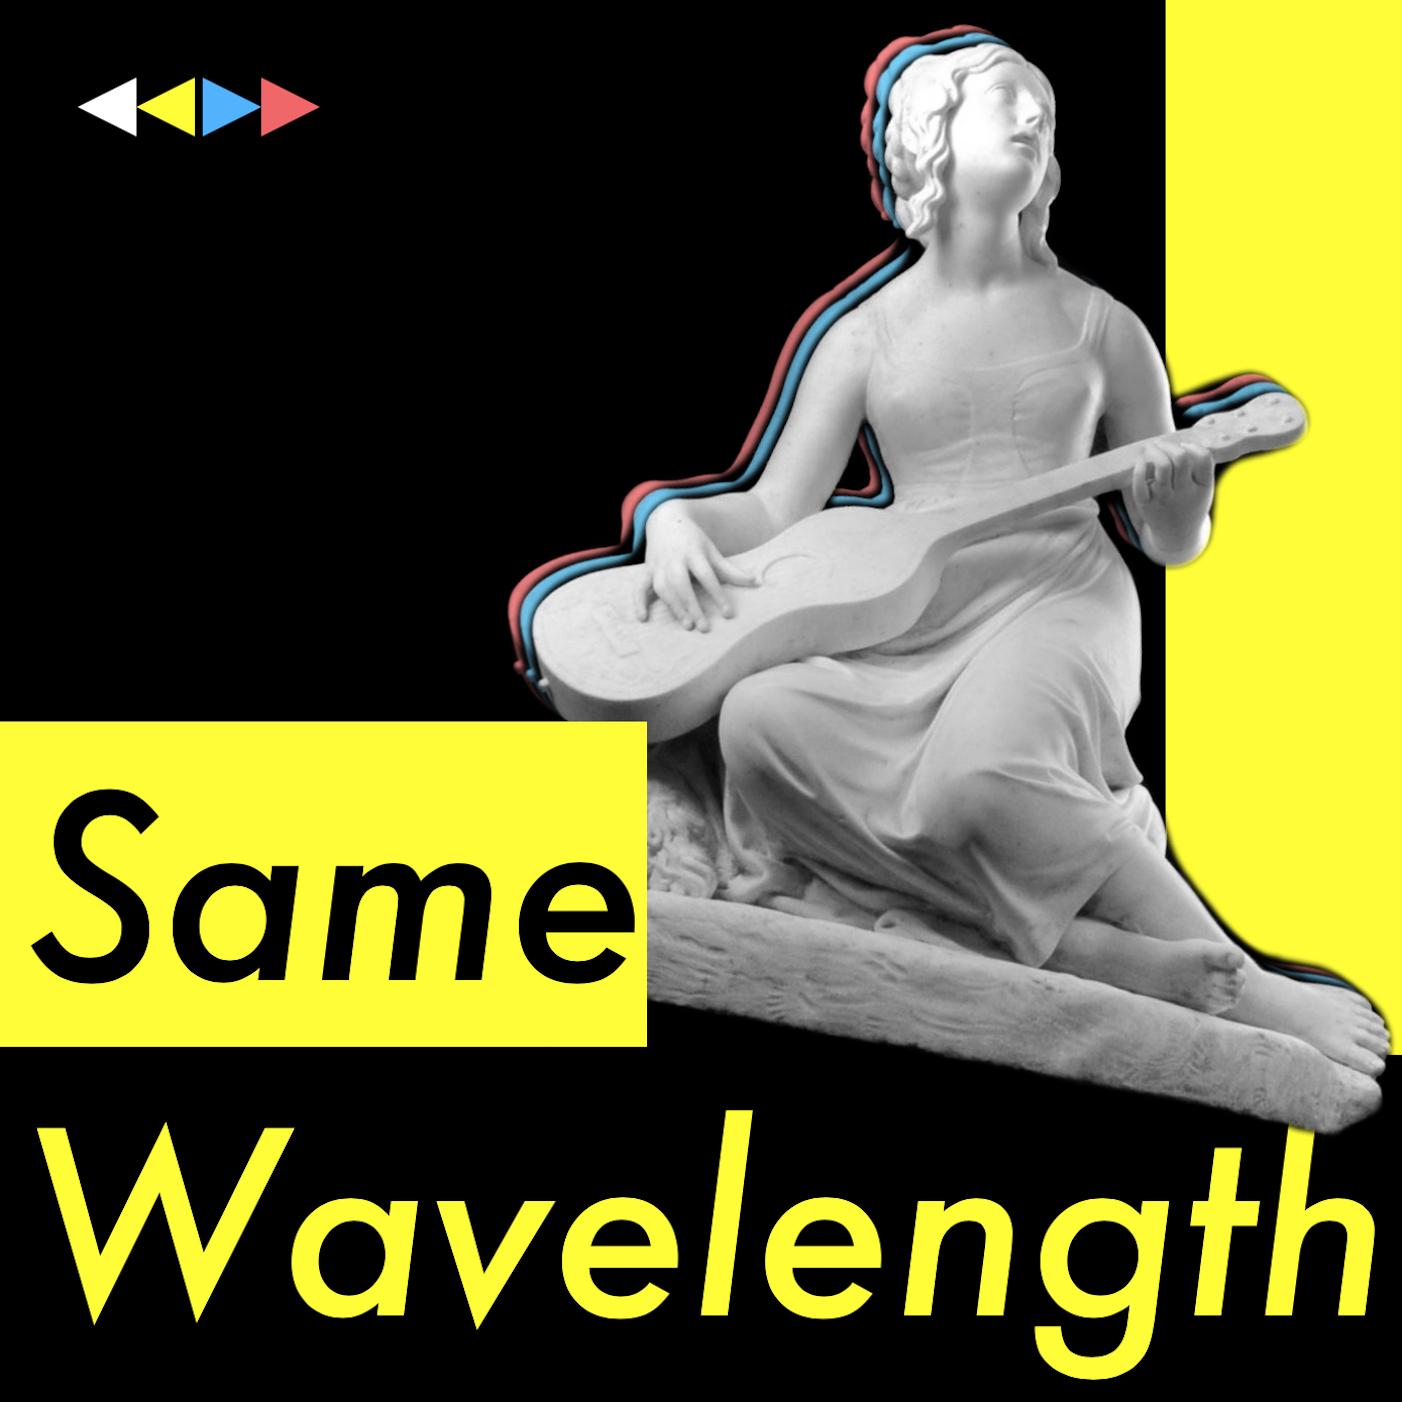 Same Wavelength Preview #2